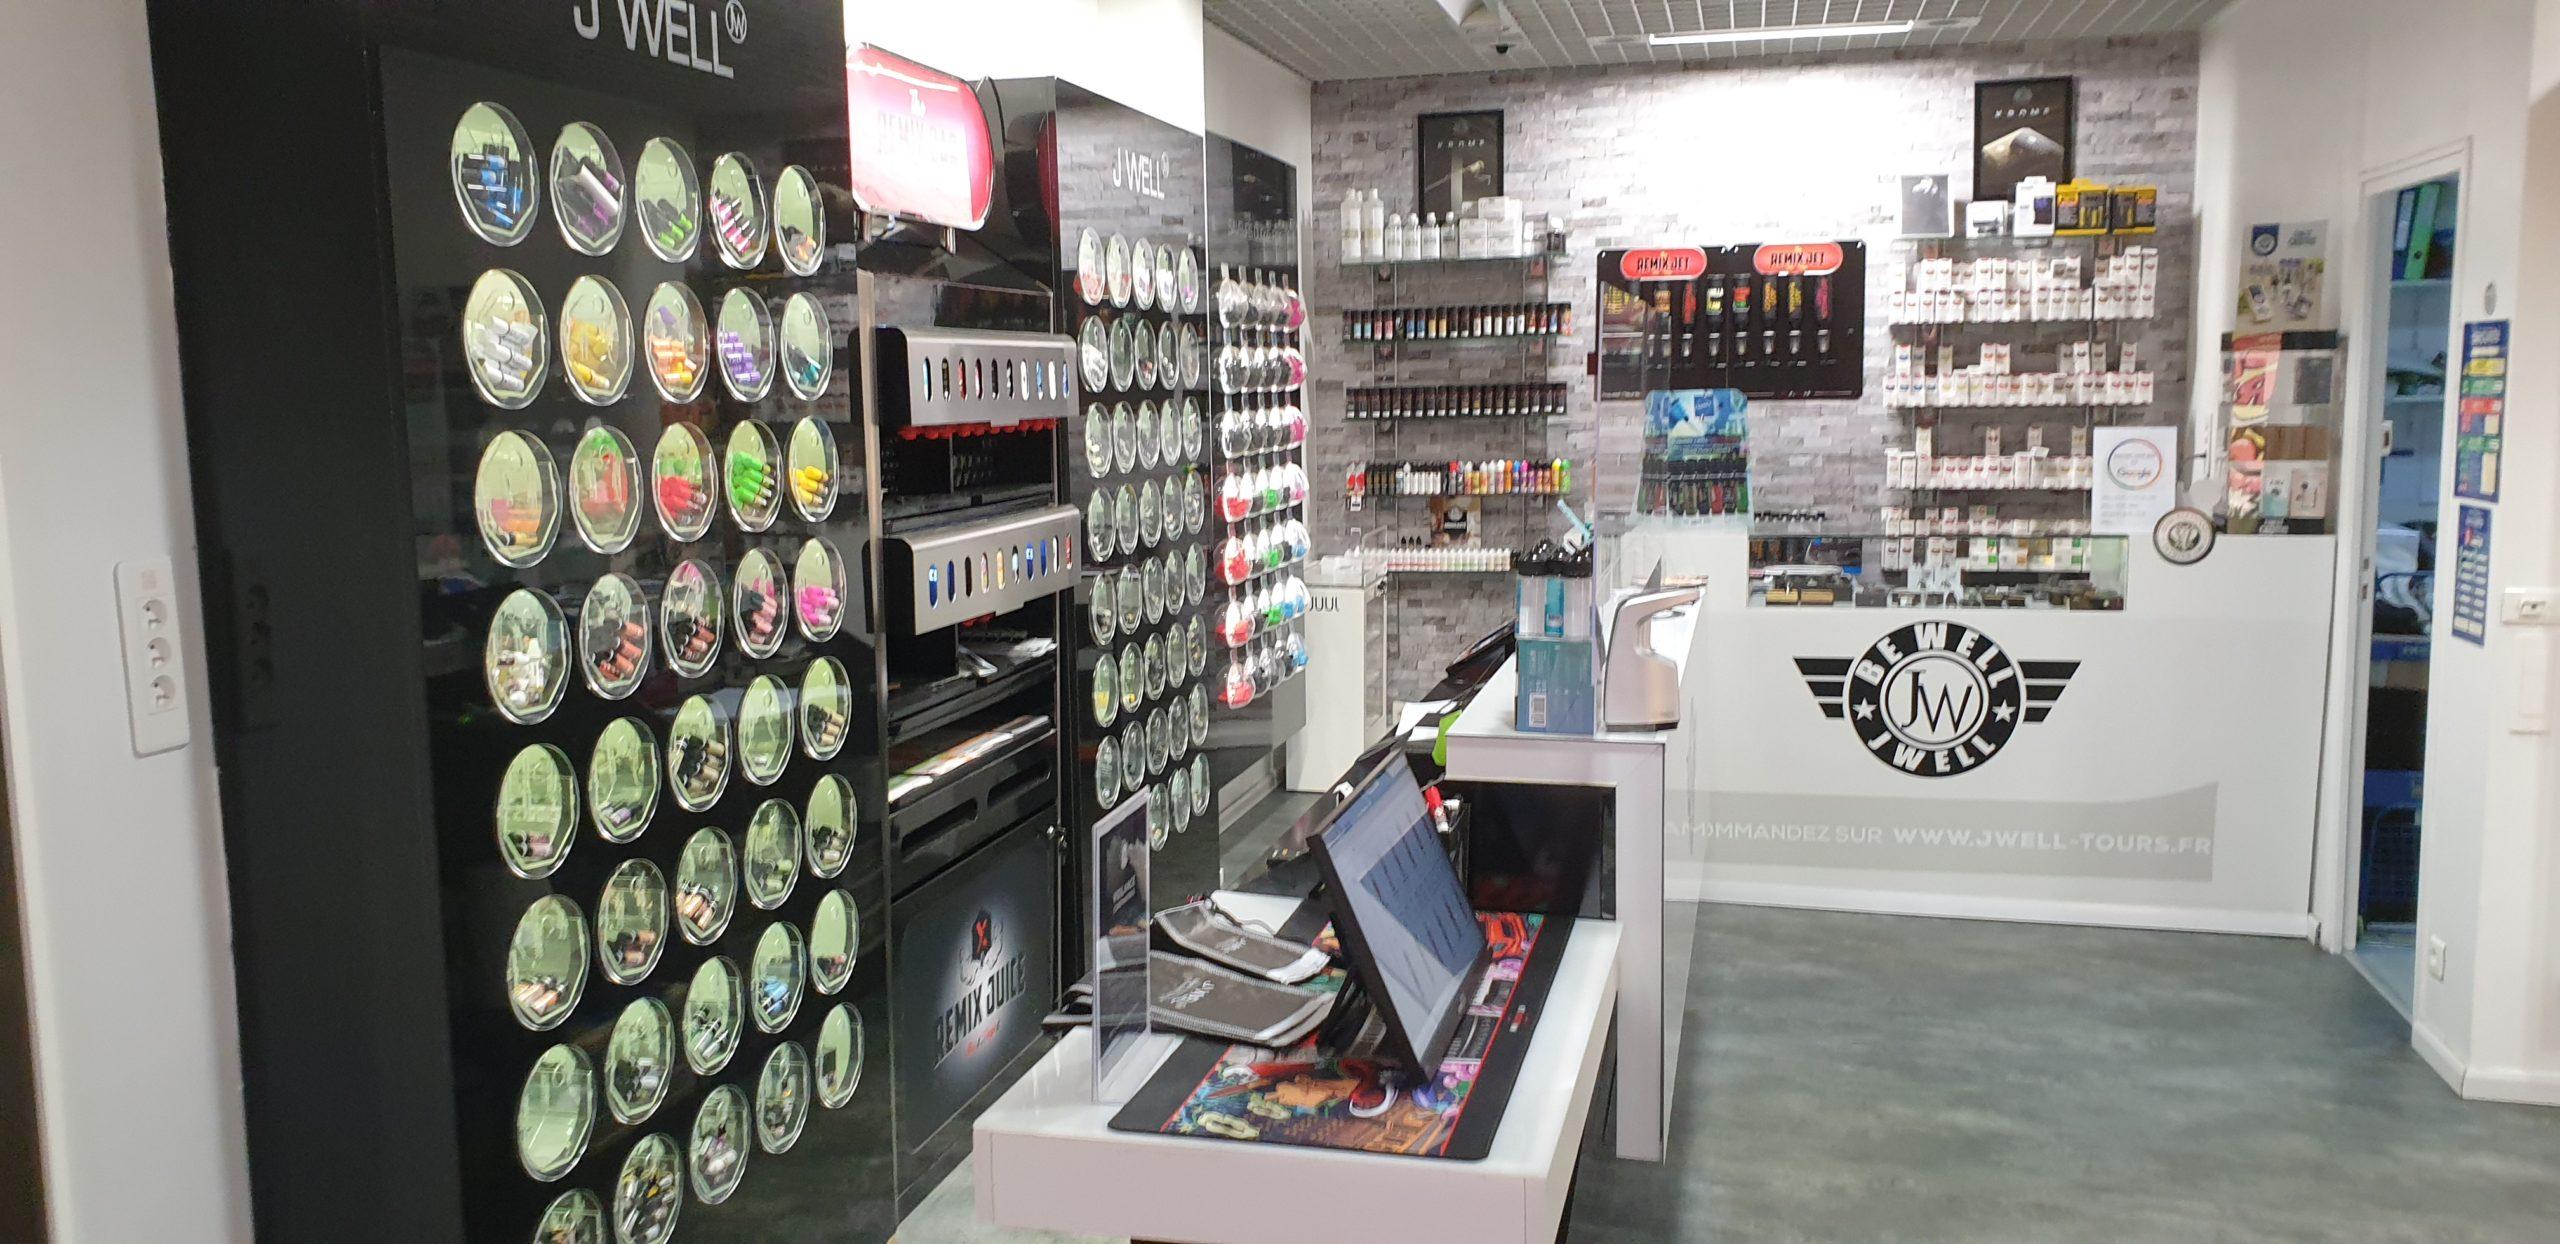 J Well Store Saint Cyr sur Loire